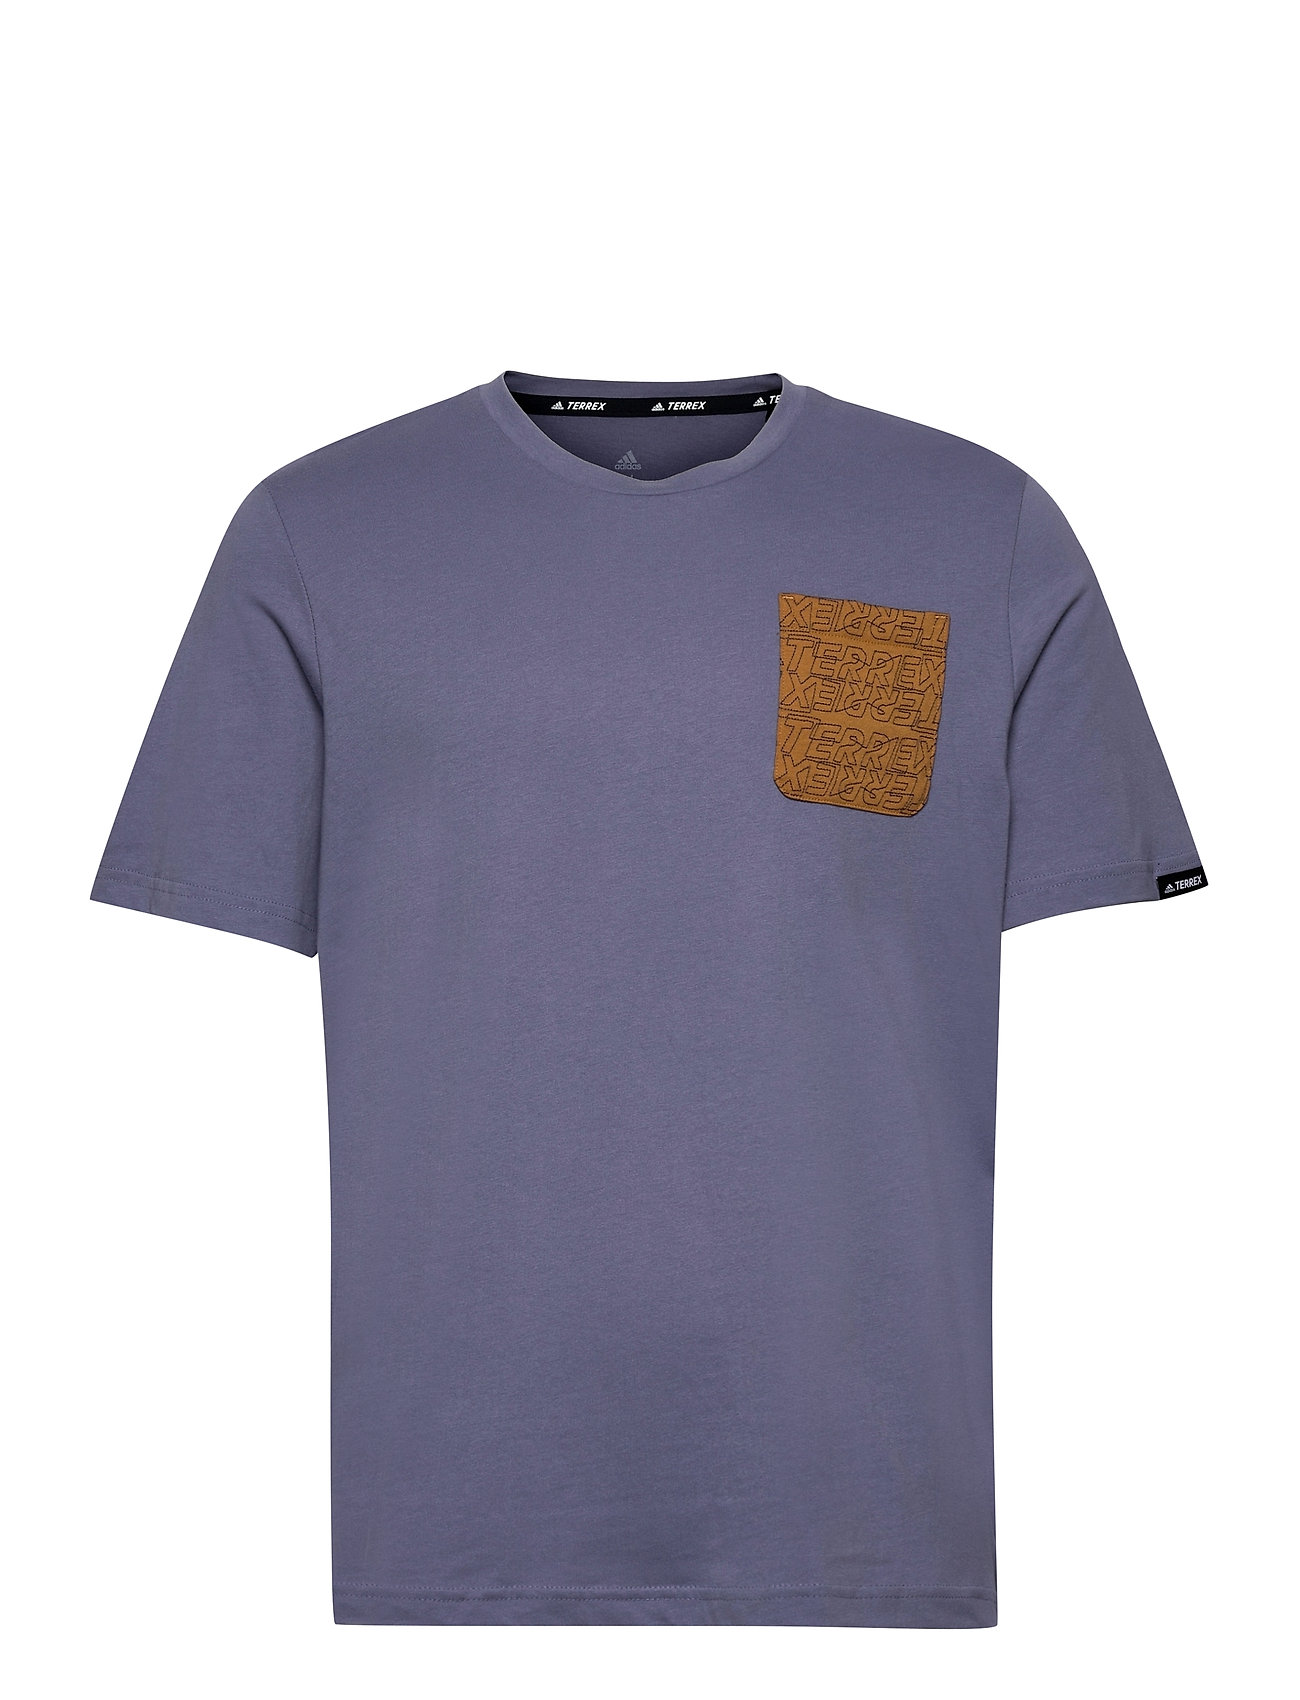 Image of Terrex Pocket Graphic Tee T-shirt Lilla Adidas Performance (3546575895)